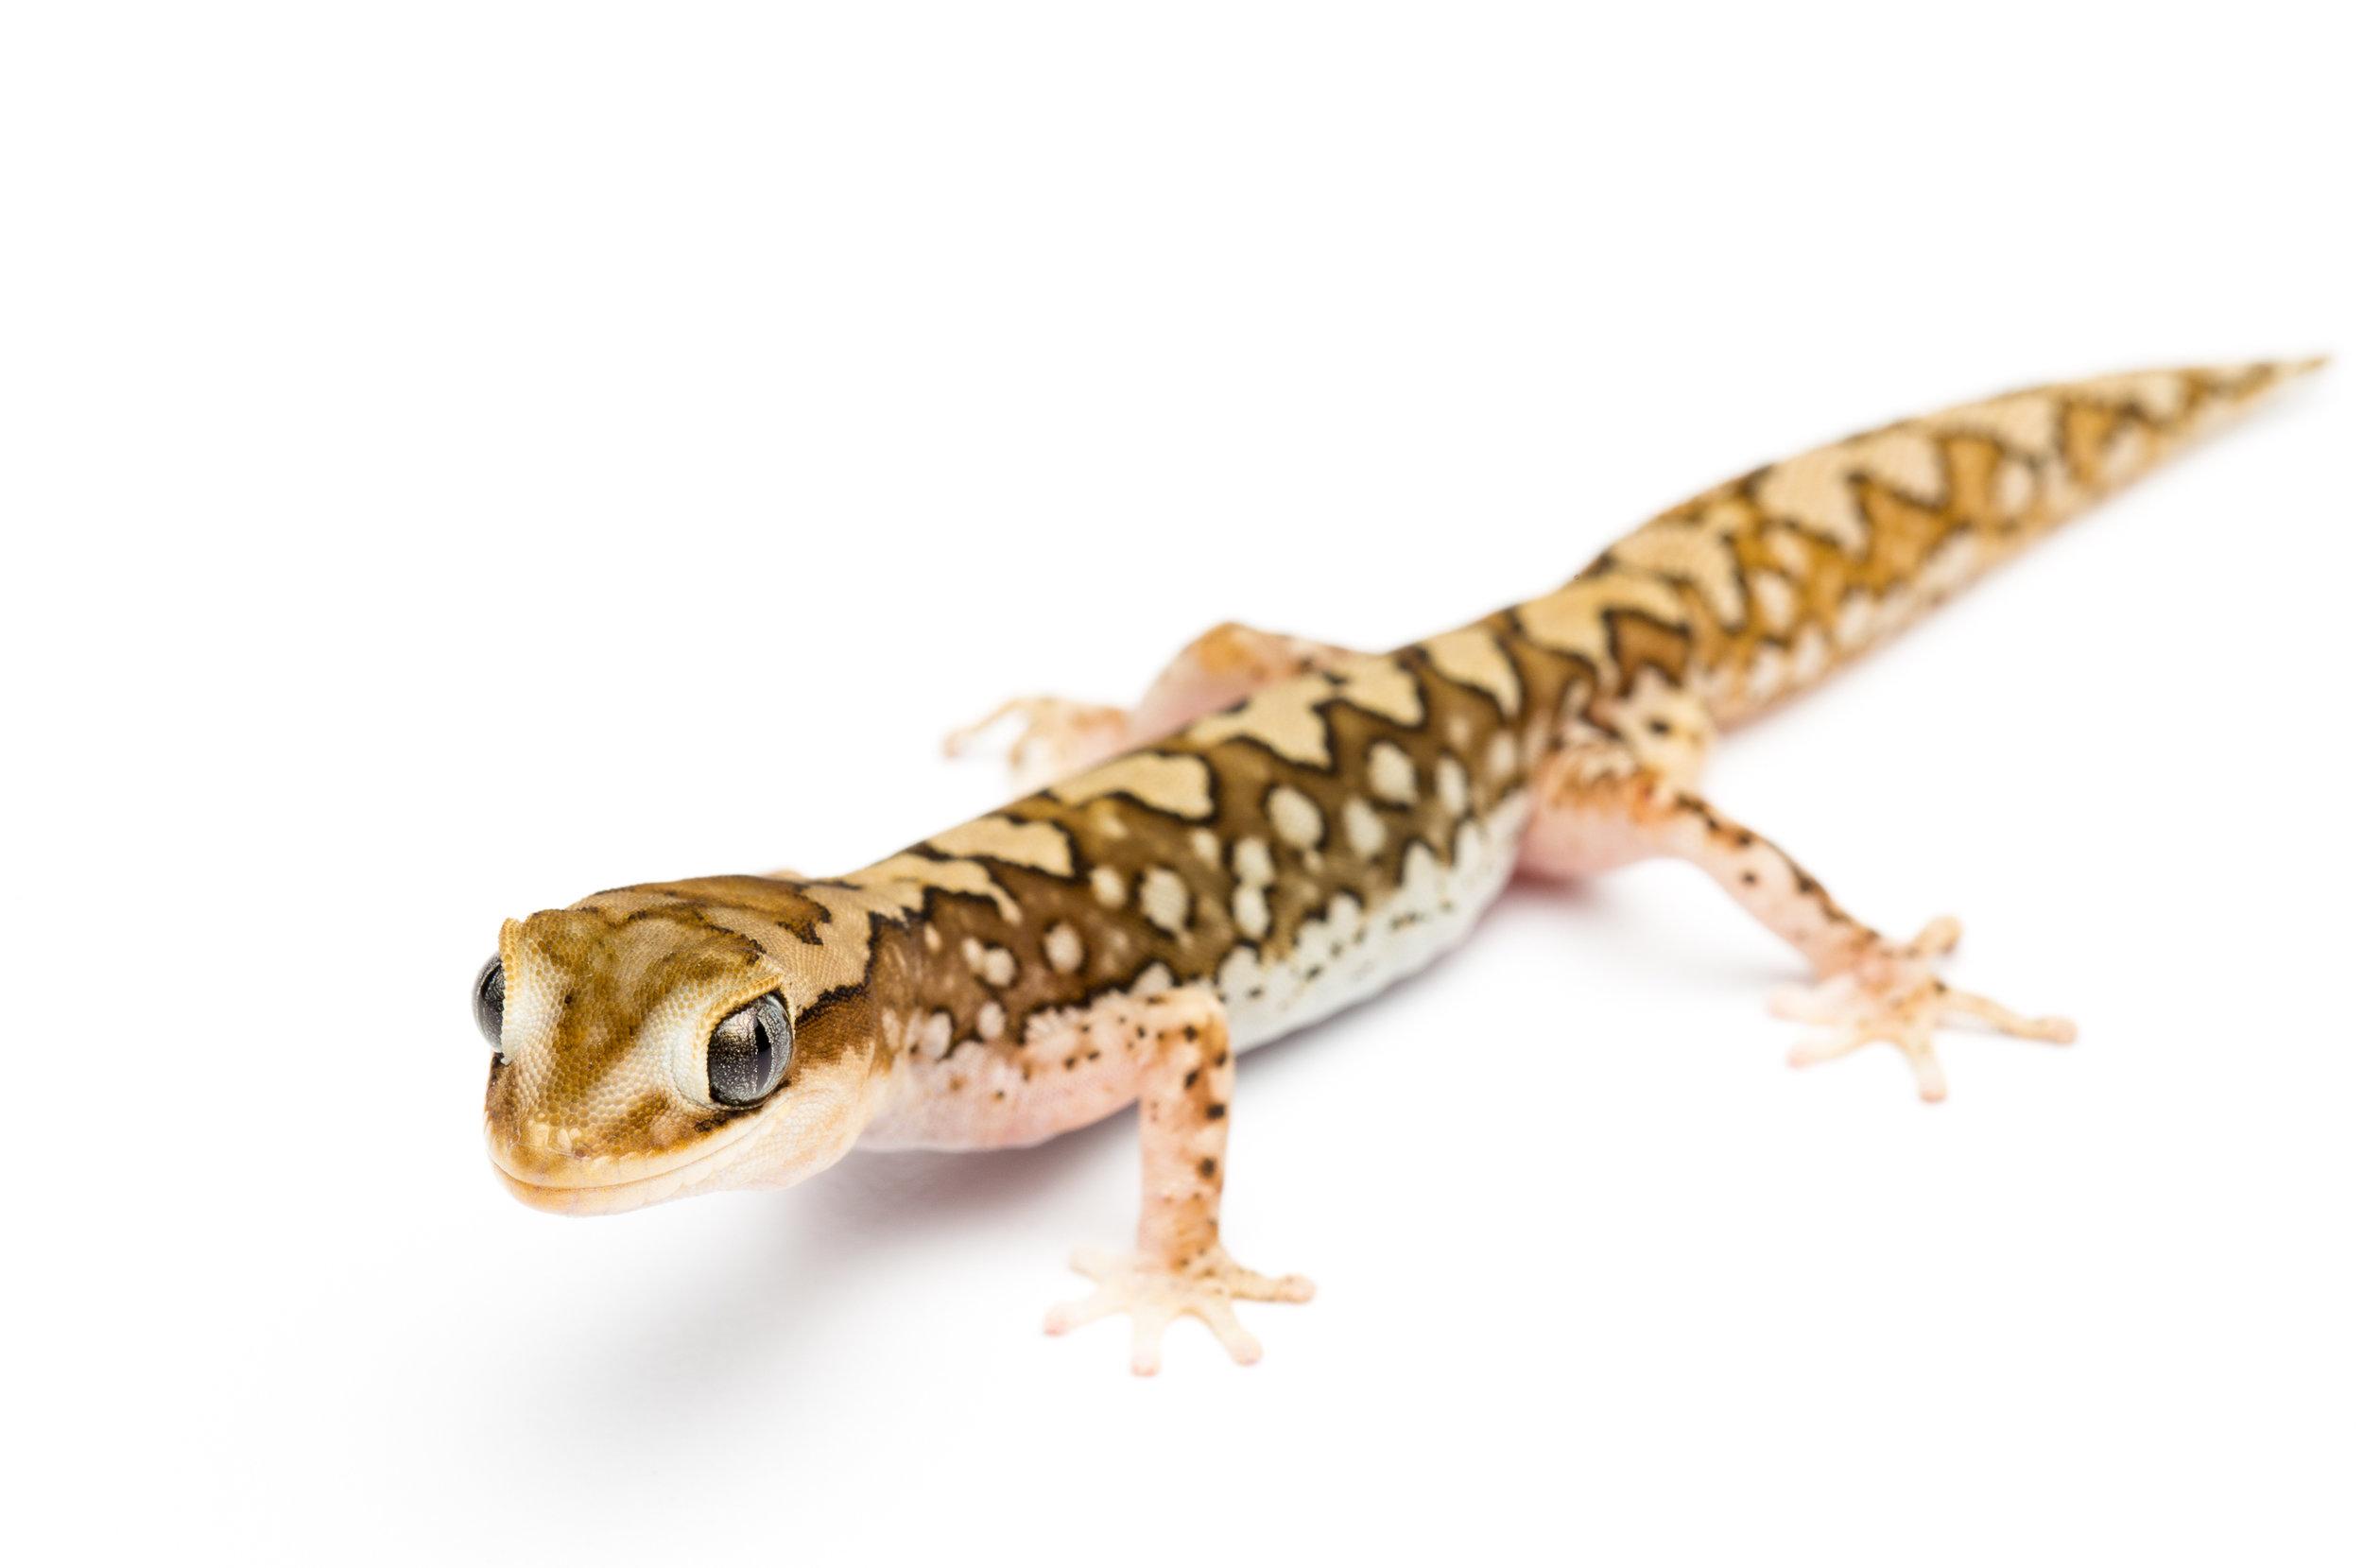 Adult male Diplodactylus furcosus